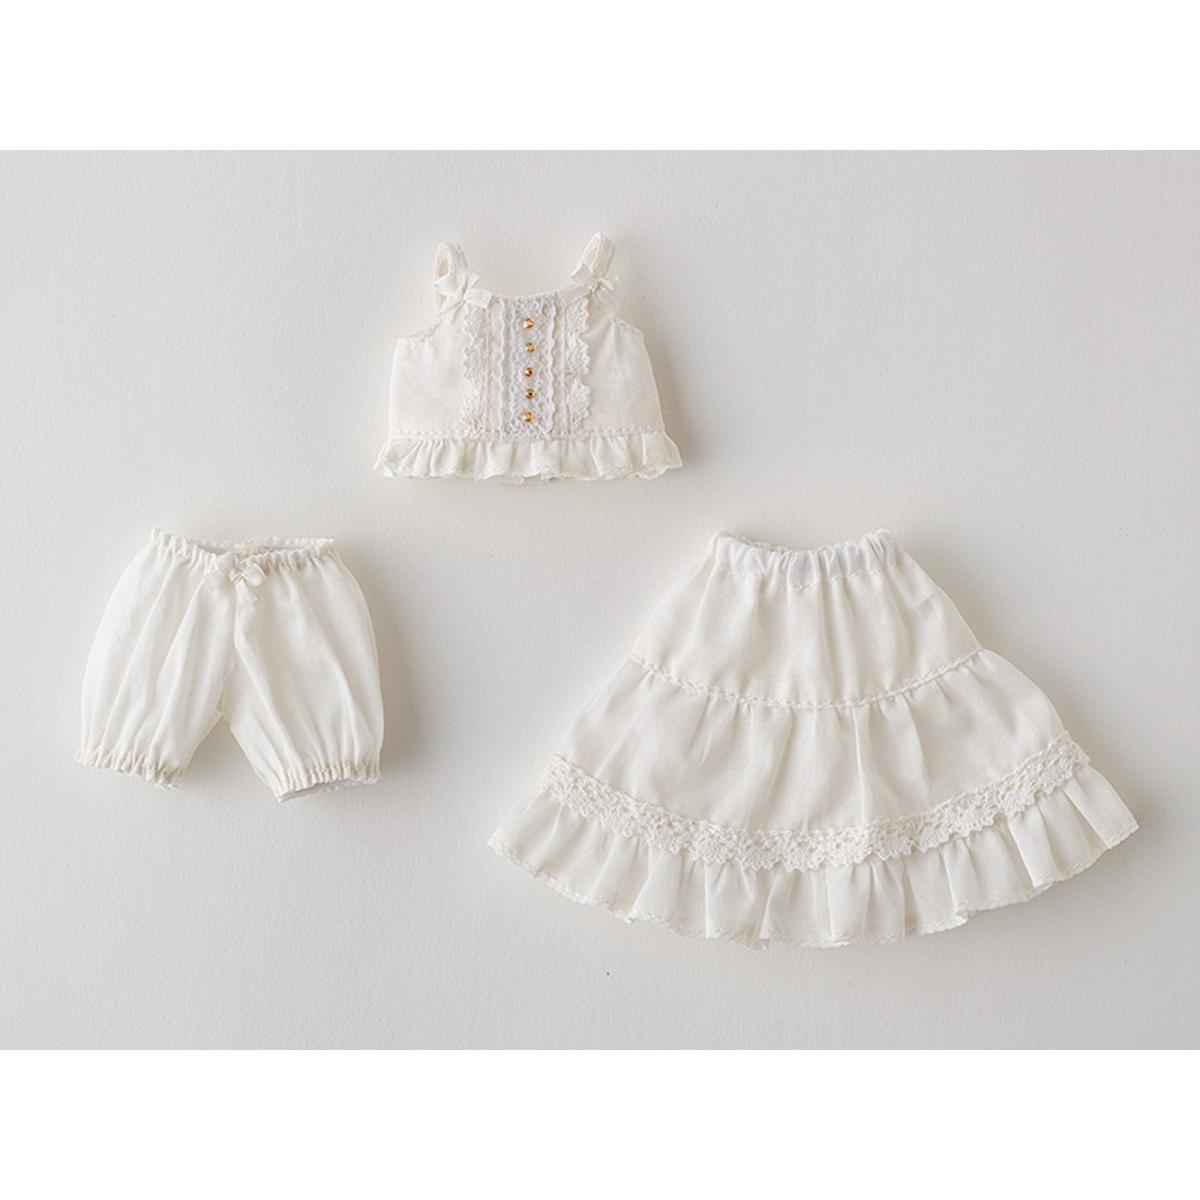 Harmonia bloom Roomwear: White